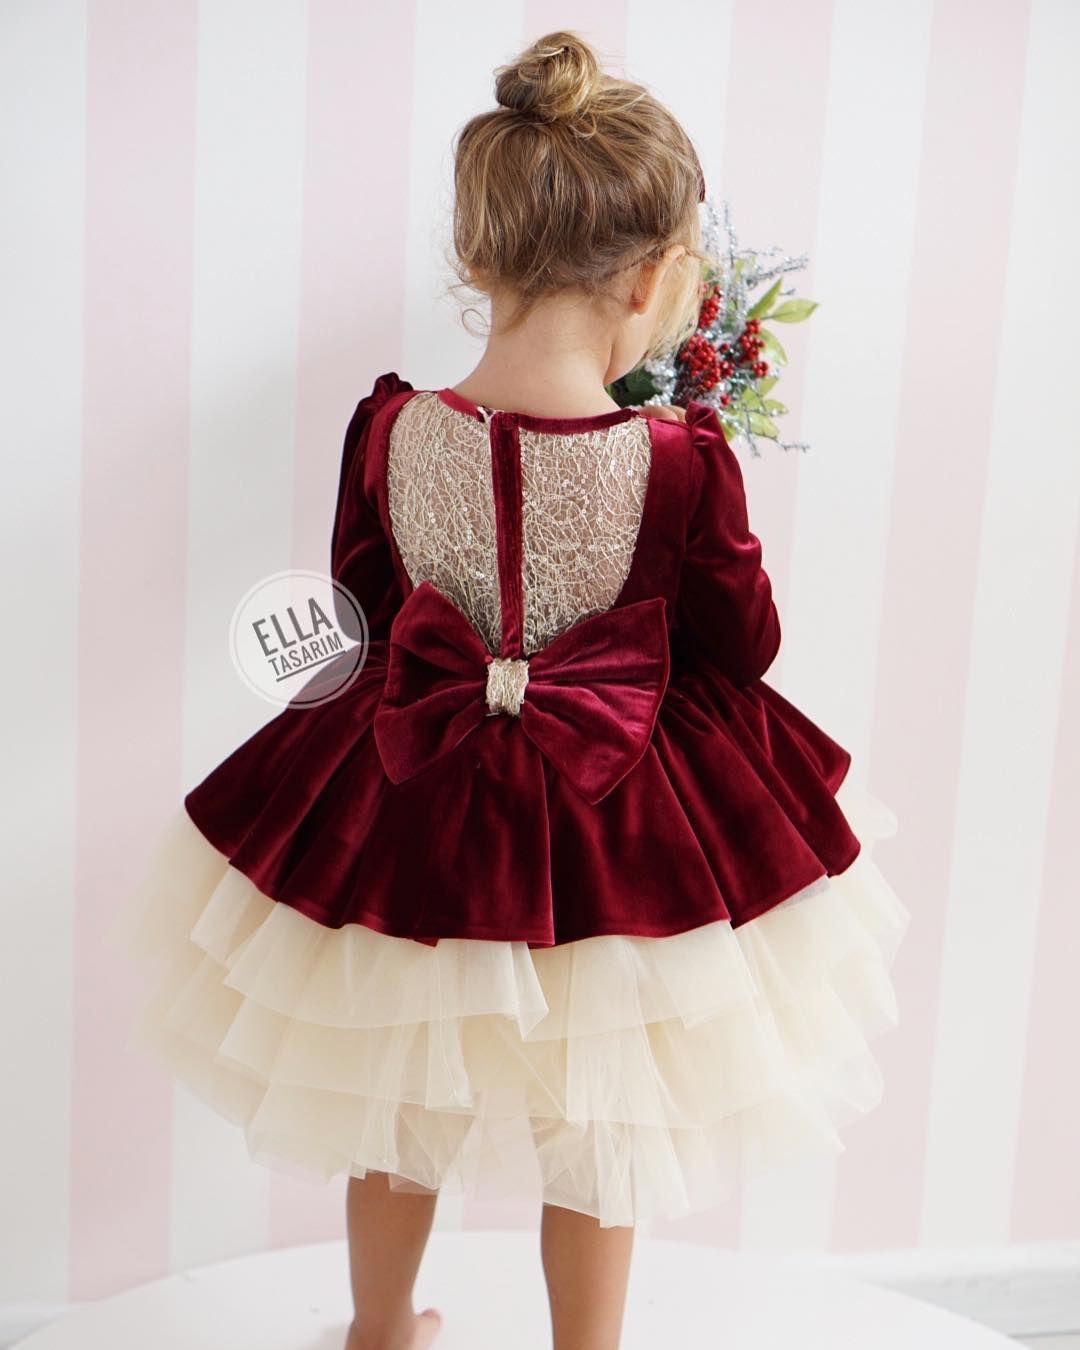 Detaylarimiz Ile Mutlu Aksamlar Beautiful Baby Girl Dresses Baby Girl Party Dresses Dresses Kids Girl